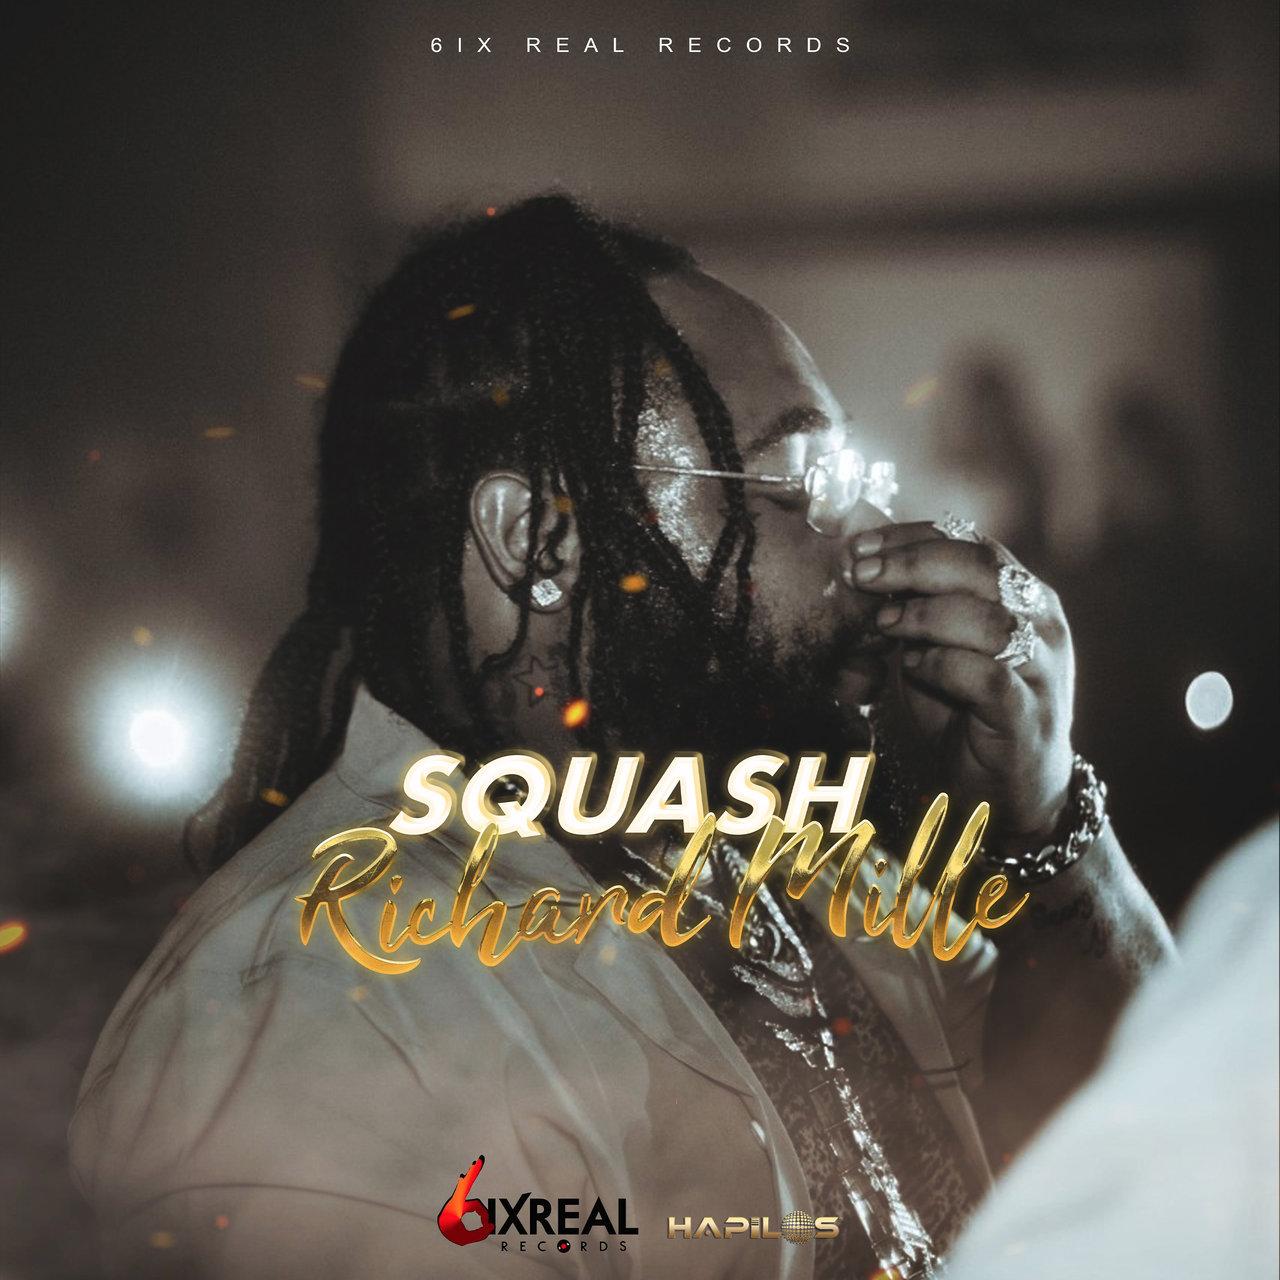 Squash - Richard Mille (Cover)